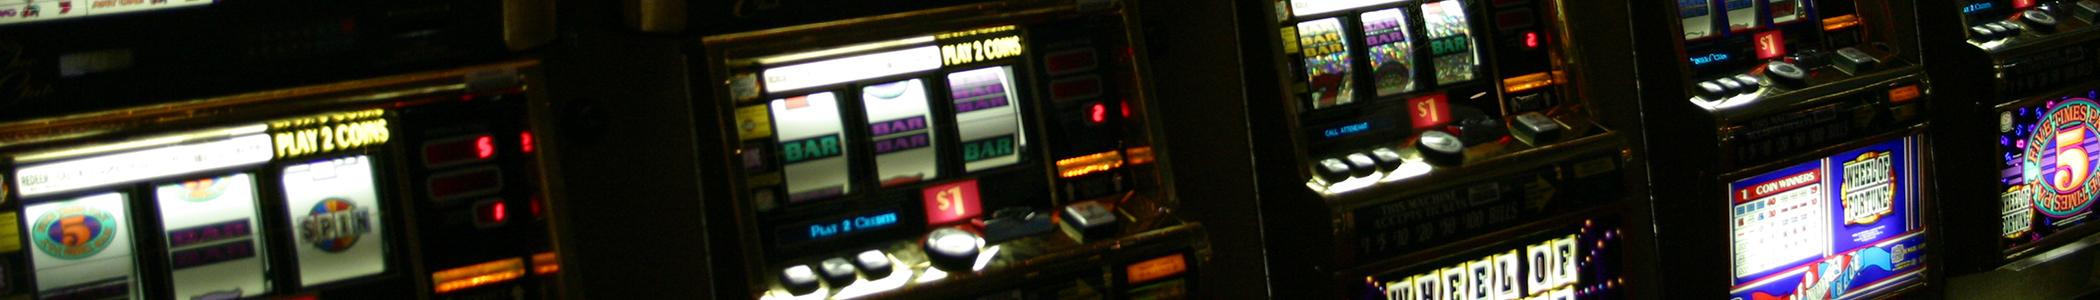 Las Vegas gay branchement sites